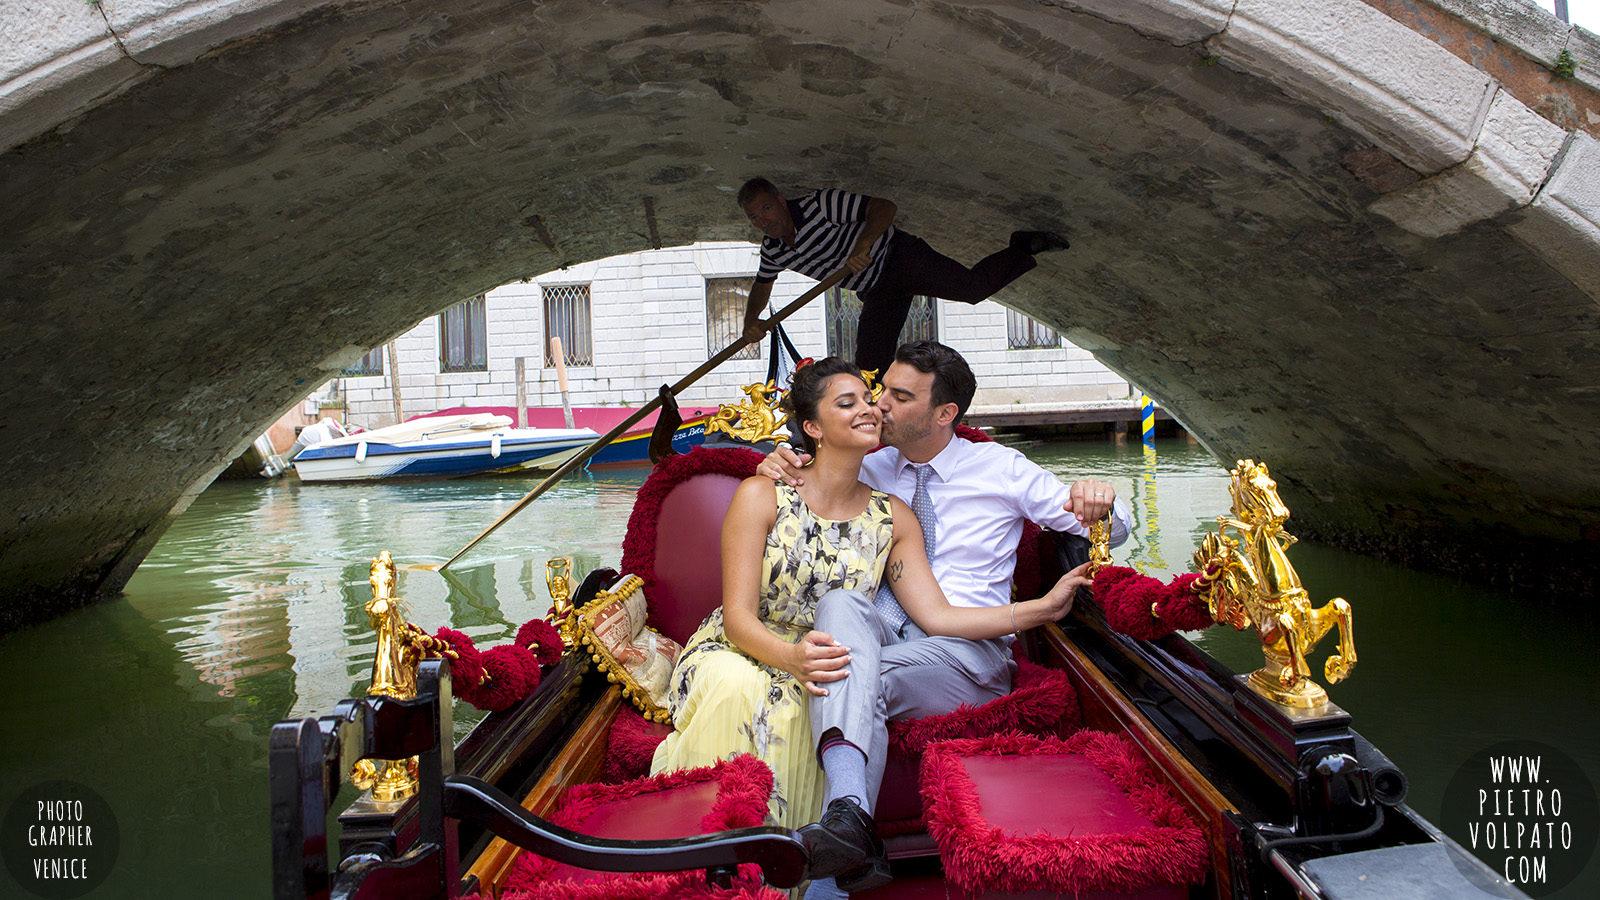 photographer-venice-italy-honeymoon-20150801_02